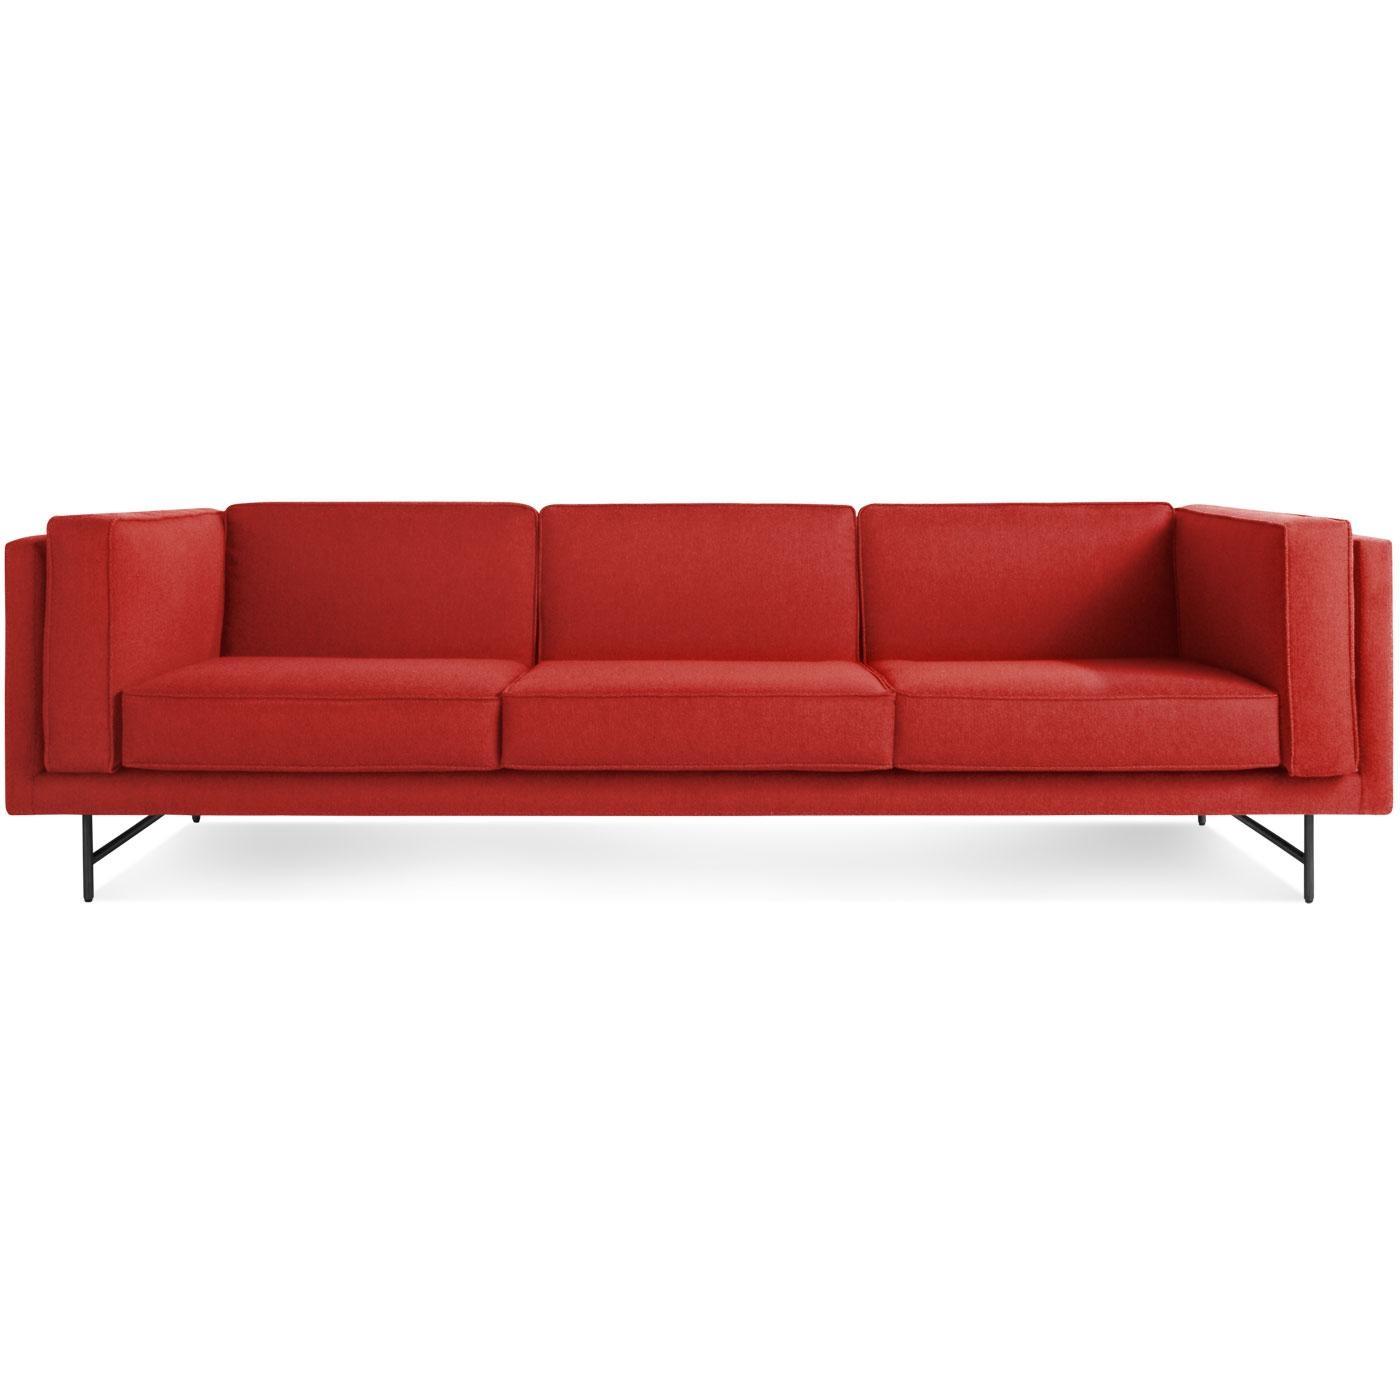 "Bank 96"" Deep Seat Sofa – Low Profile Sofa   Blu Dot Inside Blu Dot Sofas (Image 2 of 20)"